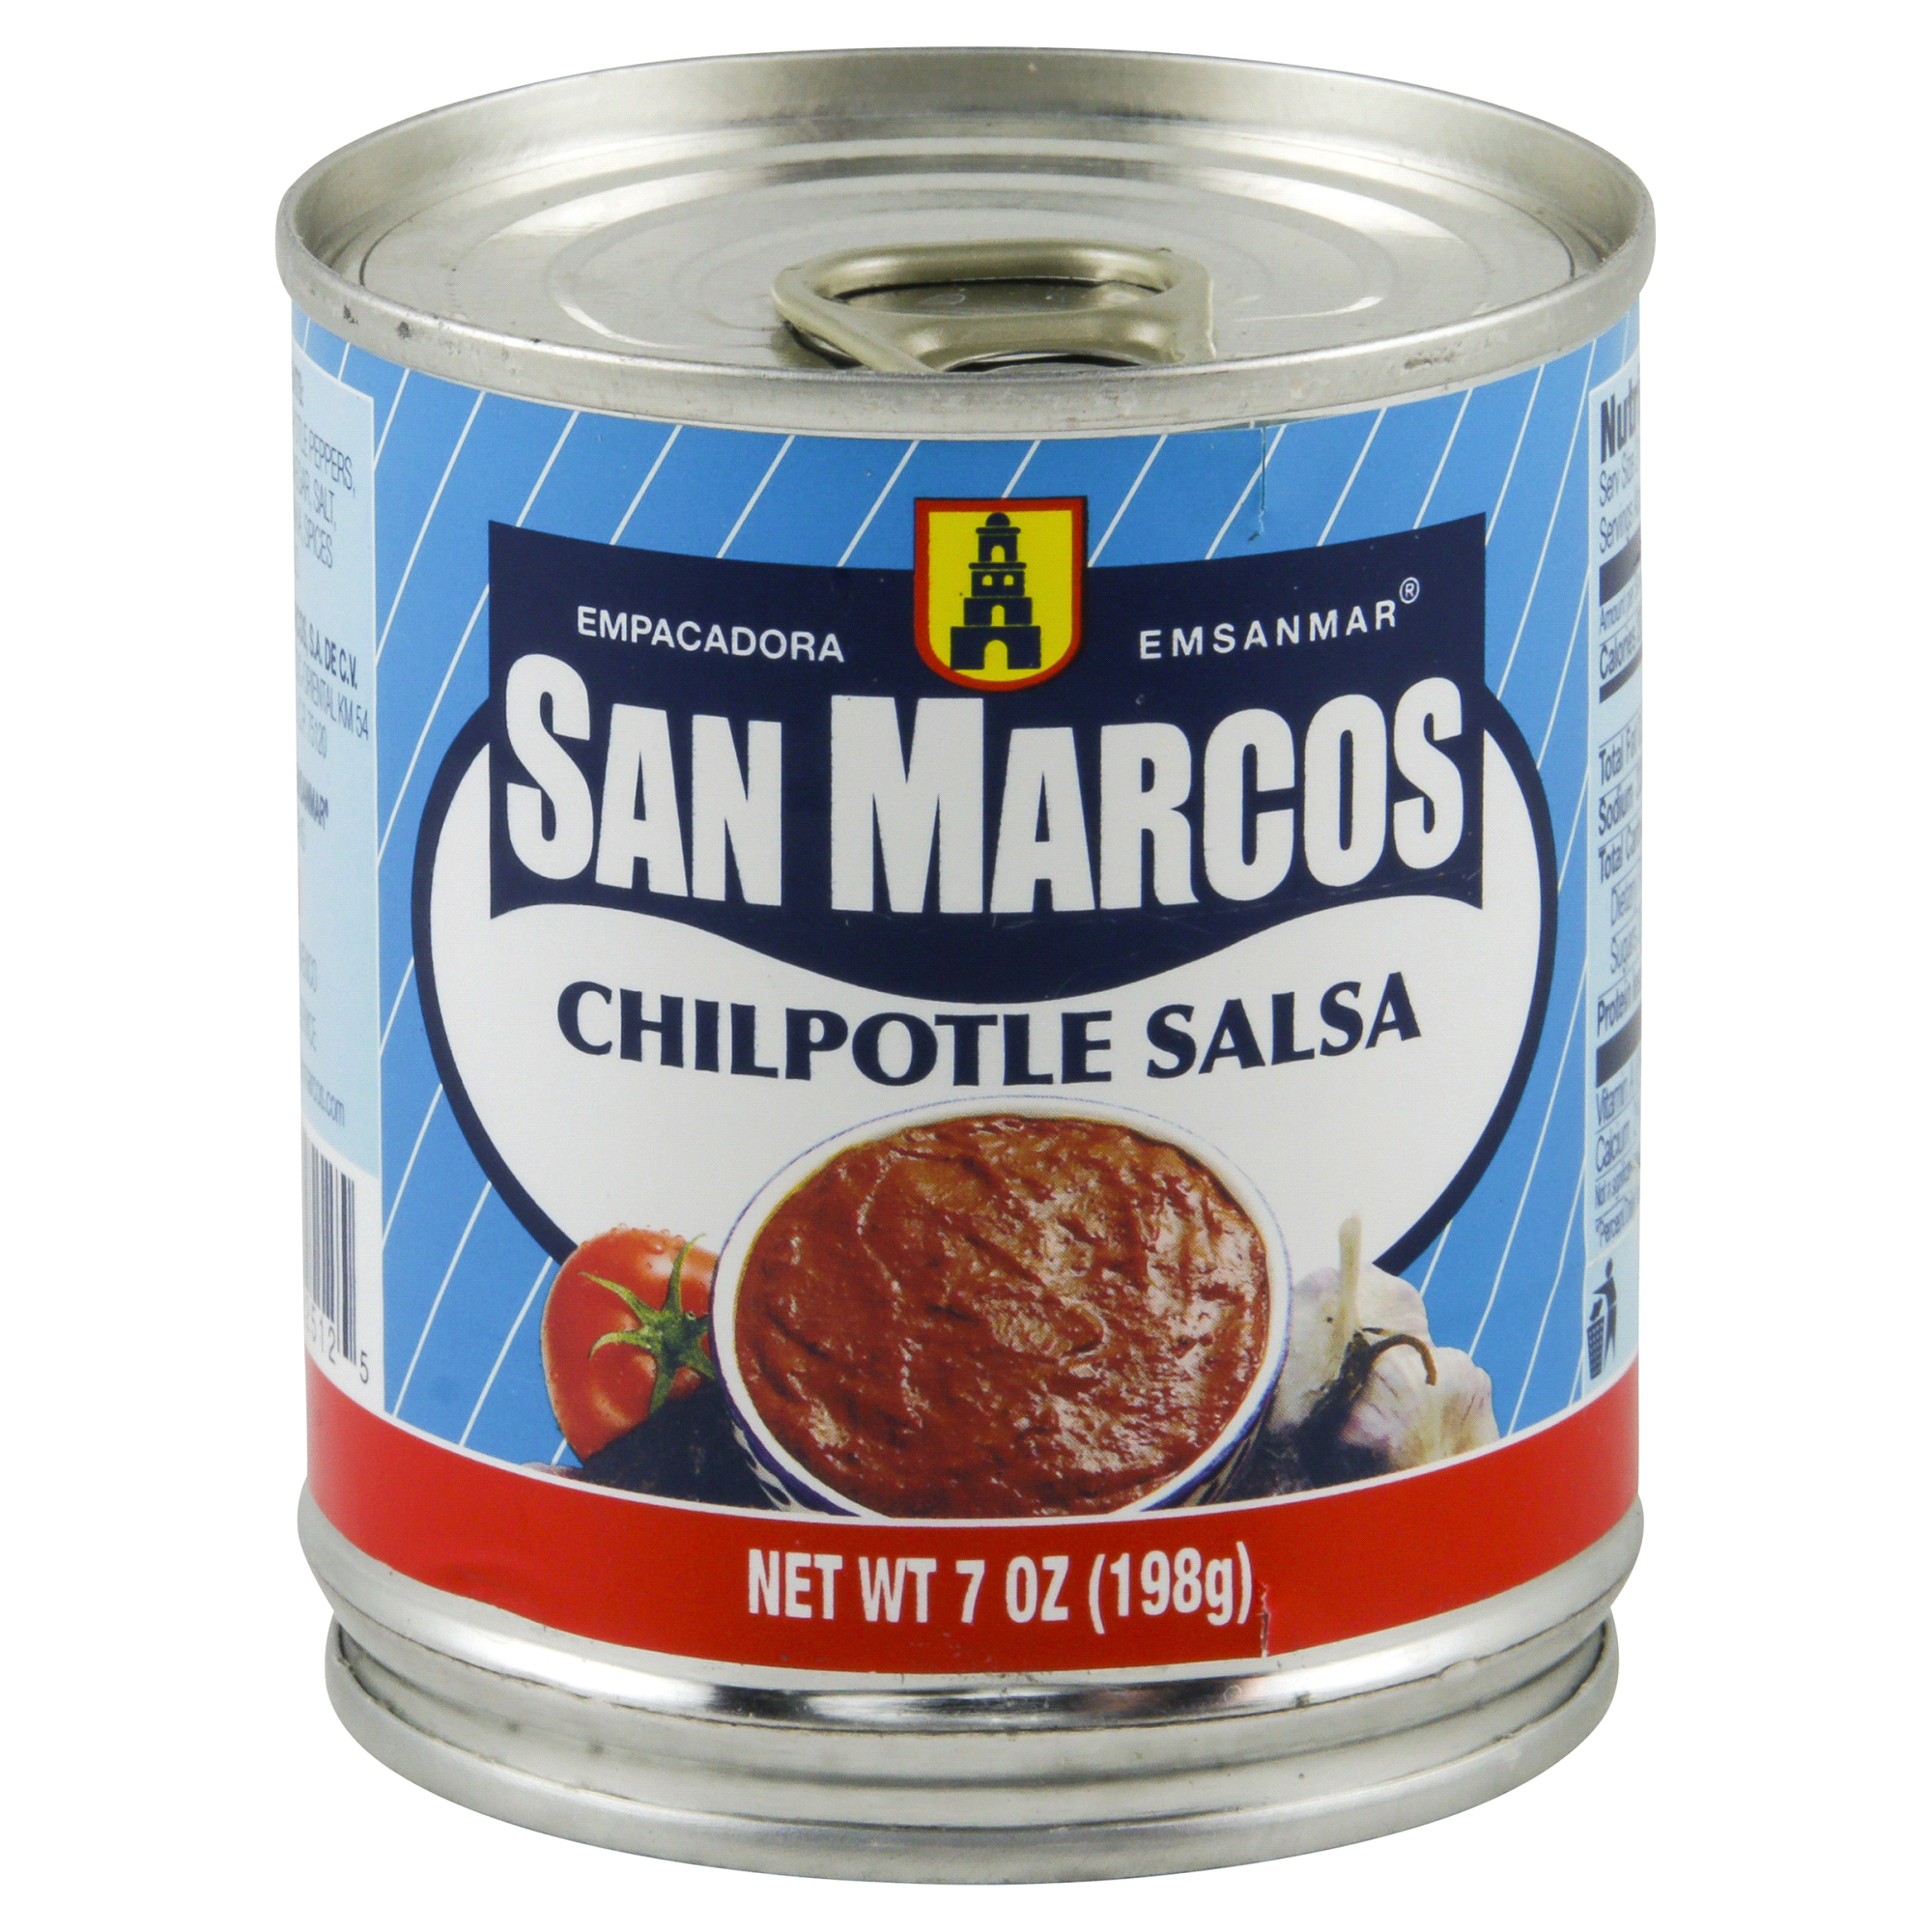 San Marcos Chipotle Salsa 7 oz. | Meijer.com